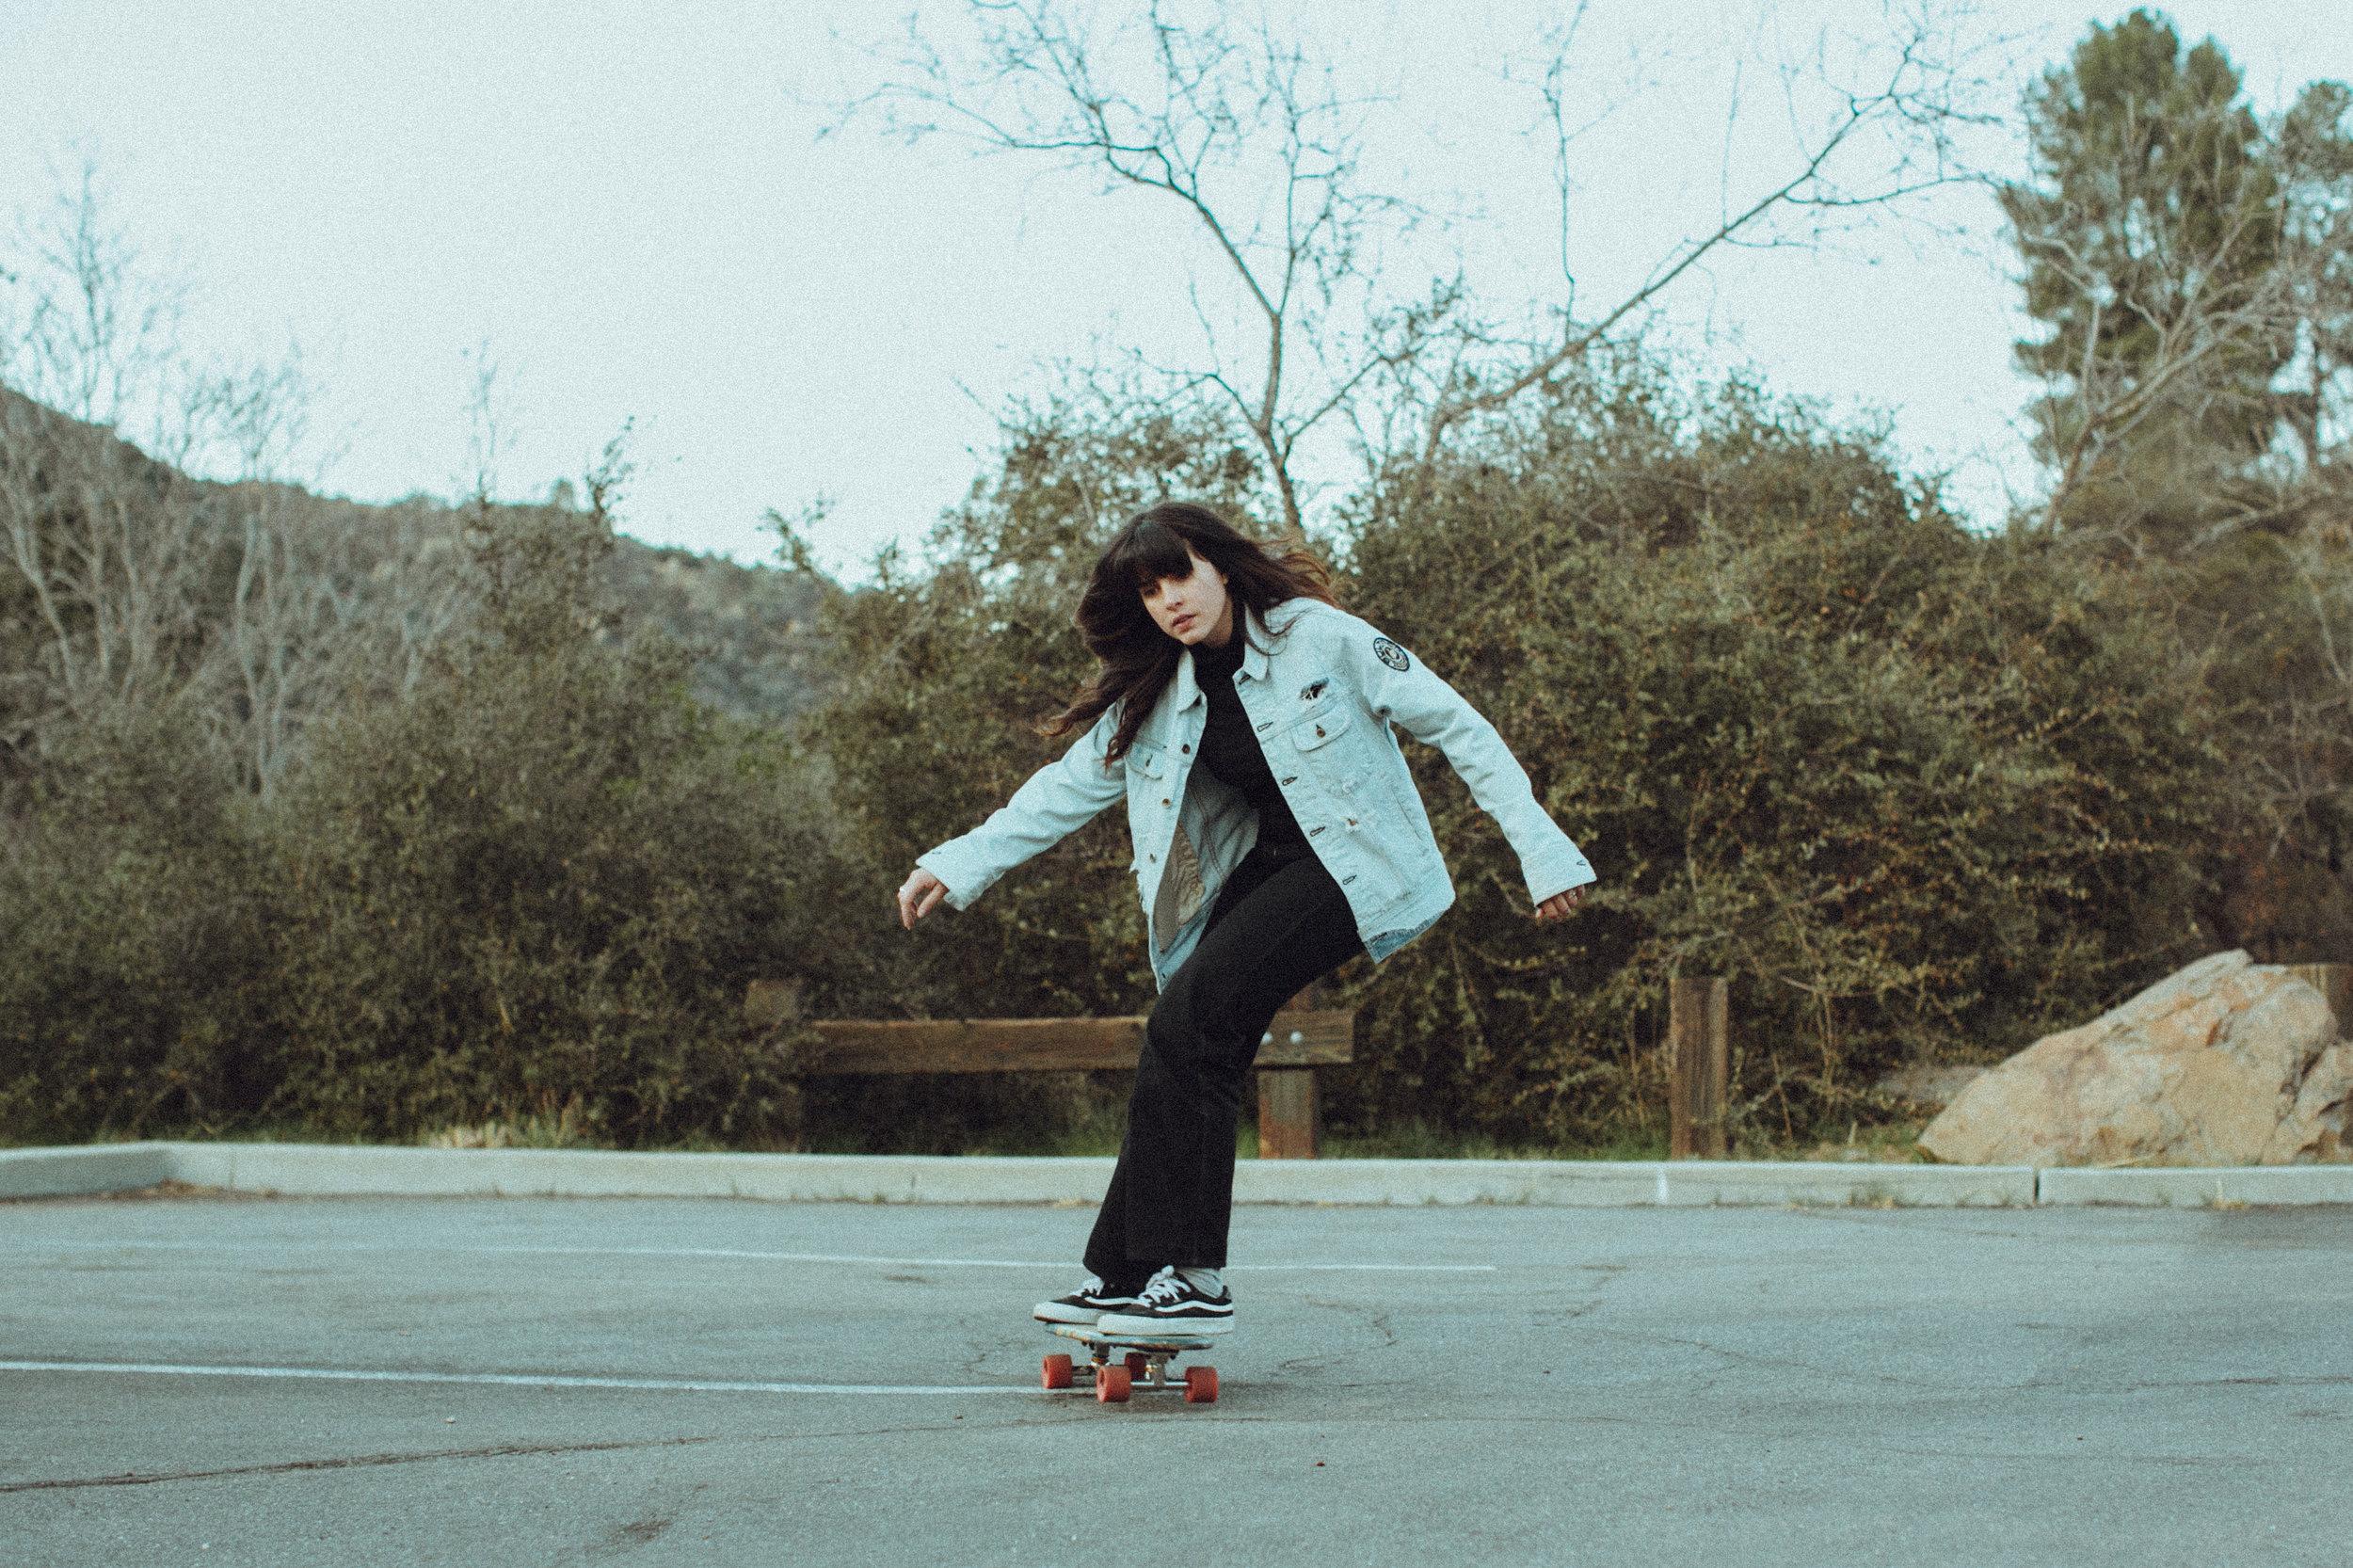 Skateboard in Topanga Canyon // Laura Goldenberger